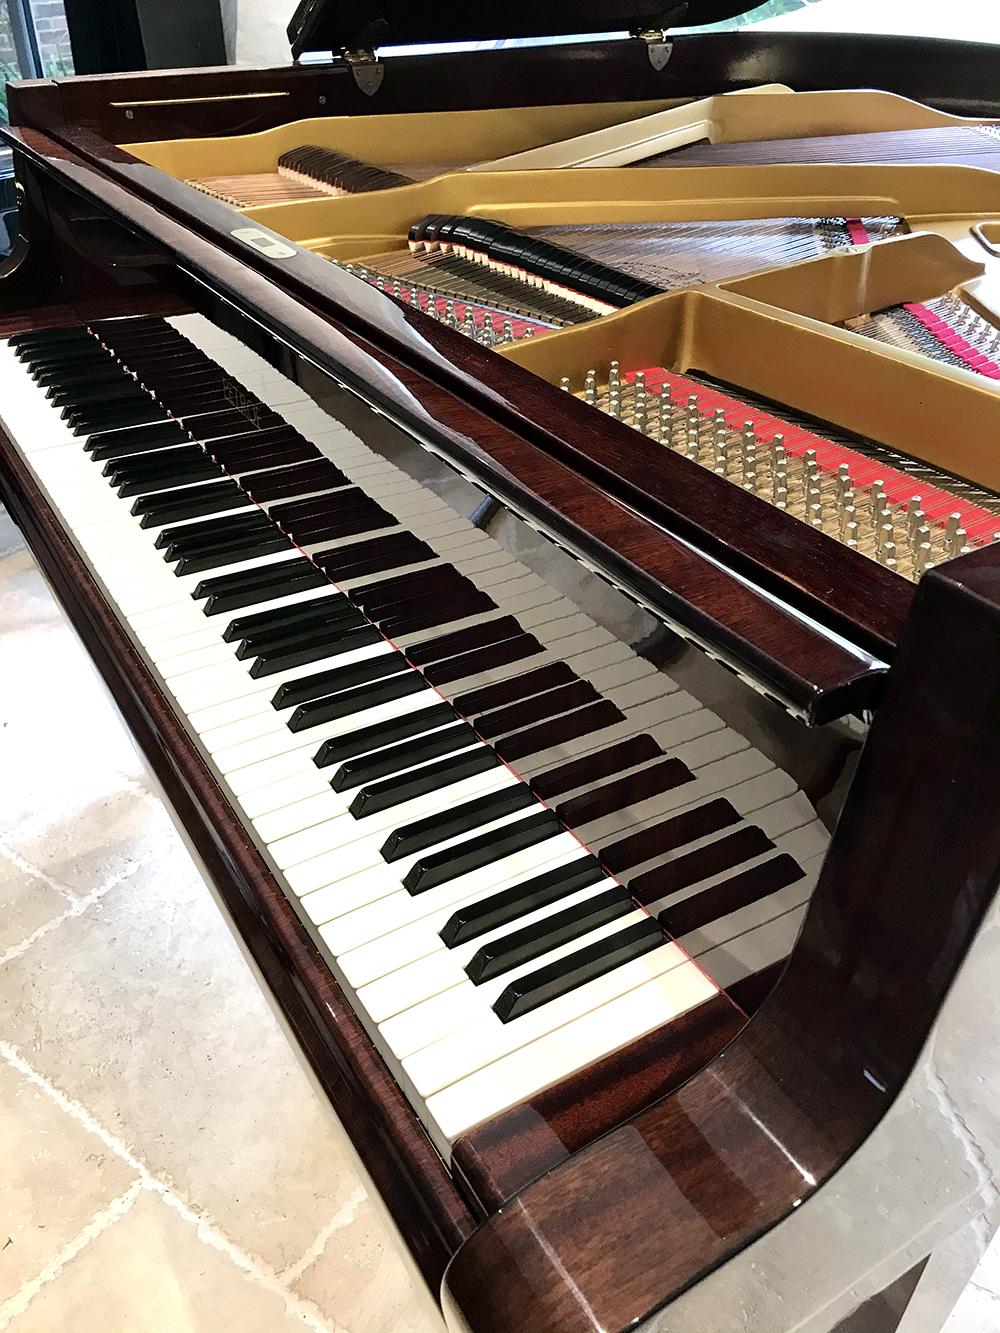 used-petrof-baby-grand-Piano-Dorset-for-sale-5.jpg